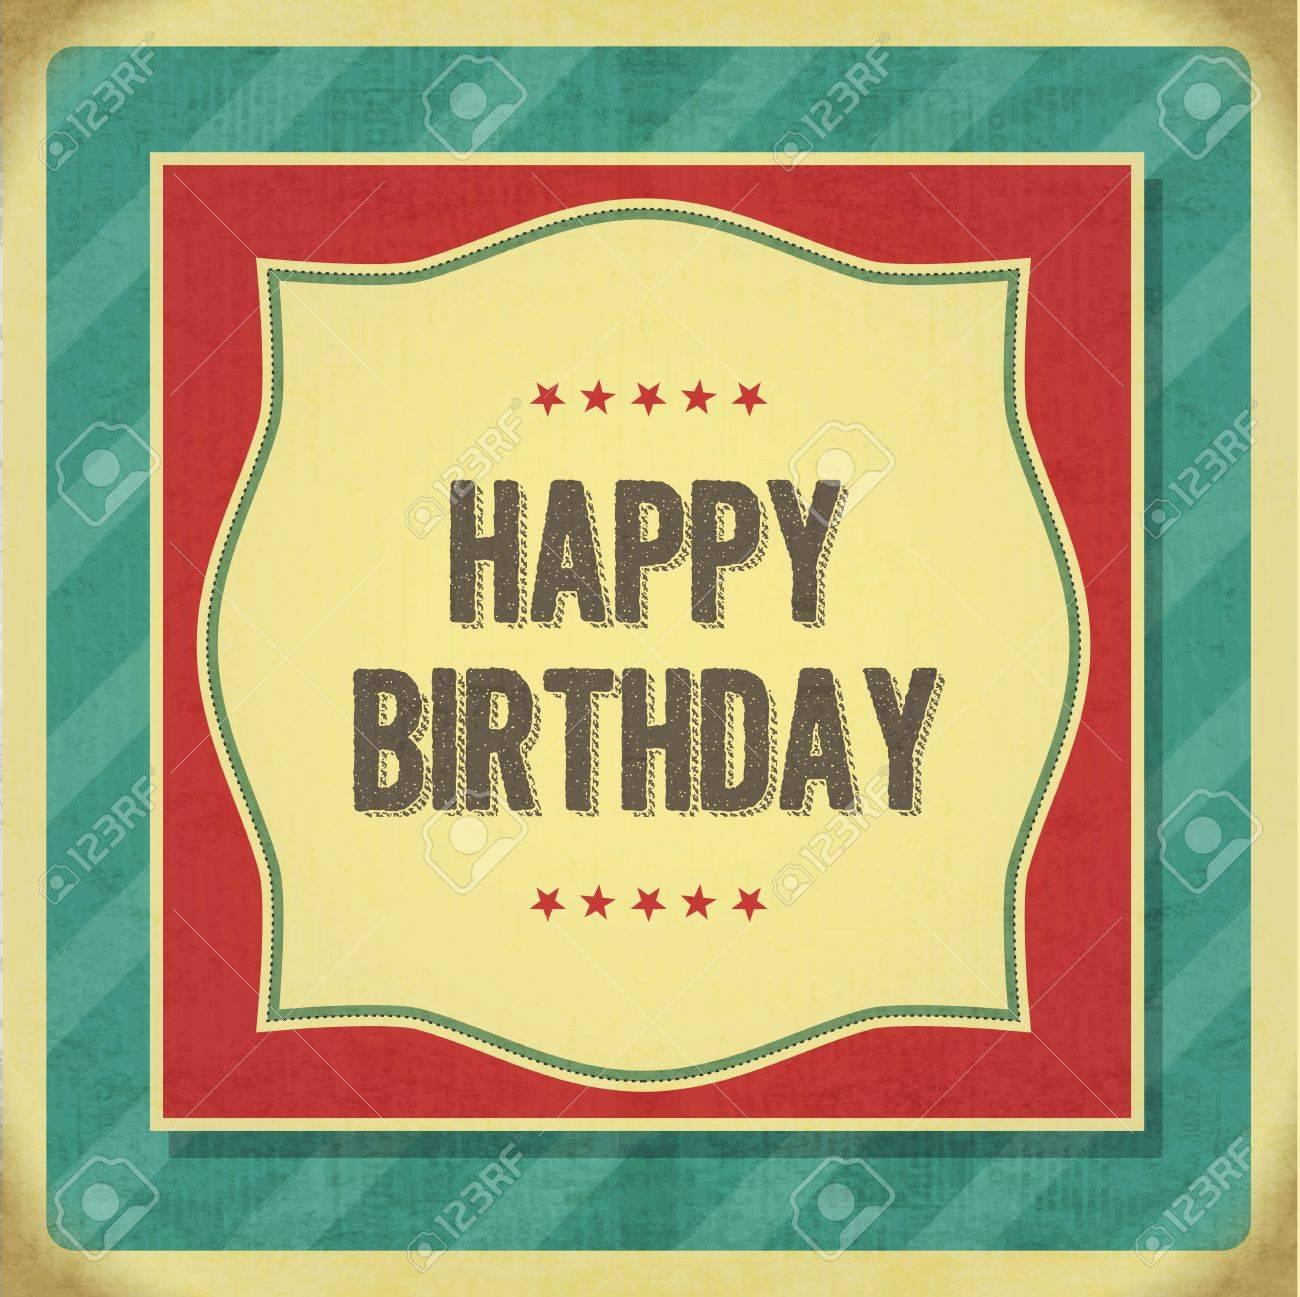 vintage retro happy birthday card. vector illustration. royalty, Birthday card